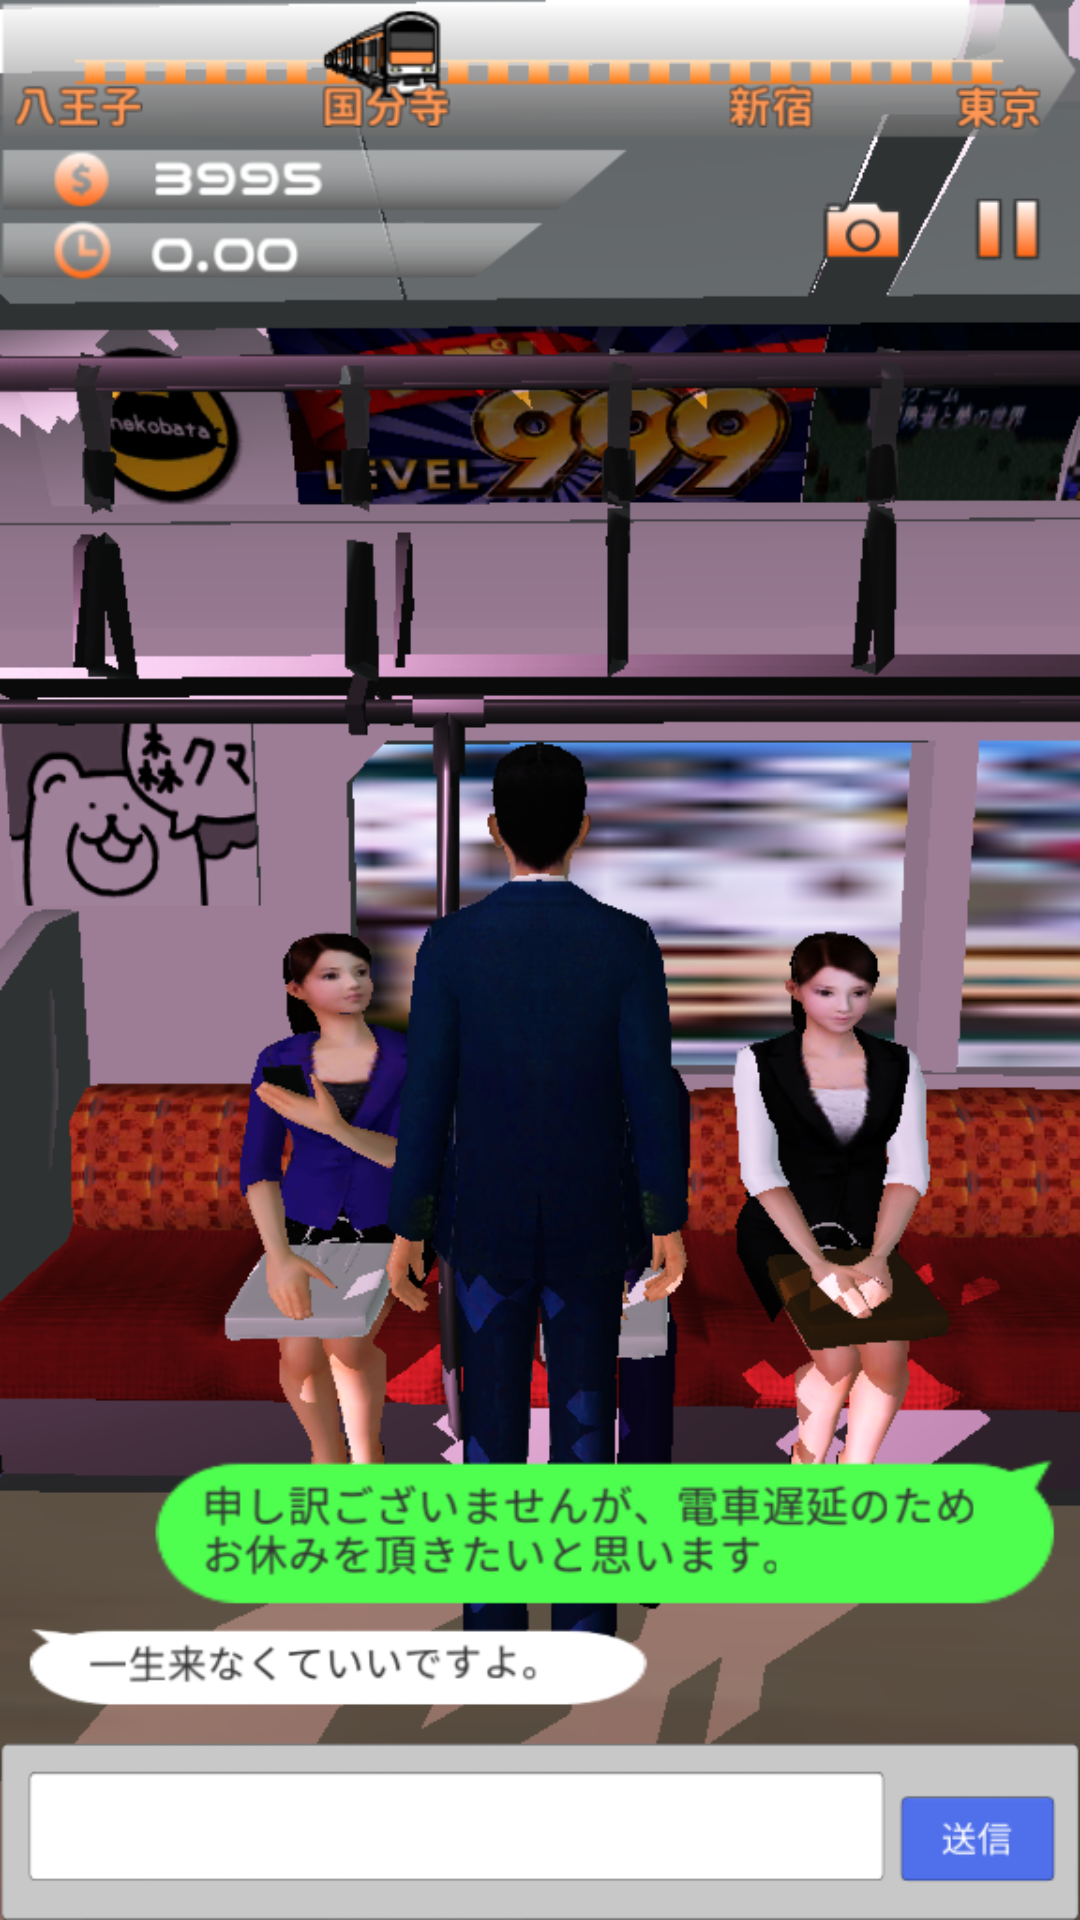 androidアプリ 30秒で通勤する方法〜八王子から東京駅まで〜攻略スクリーンショット4